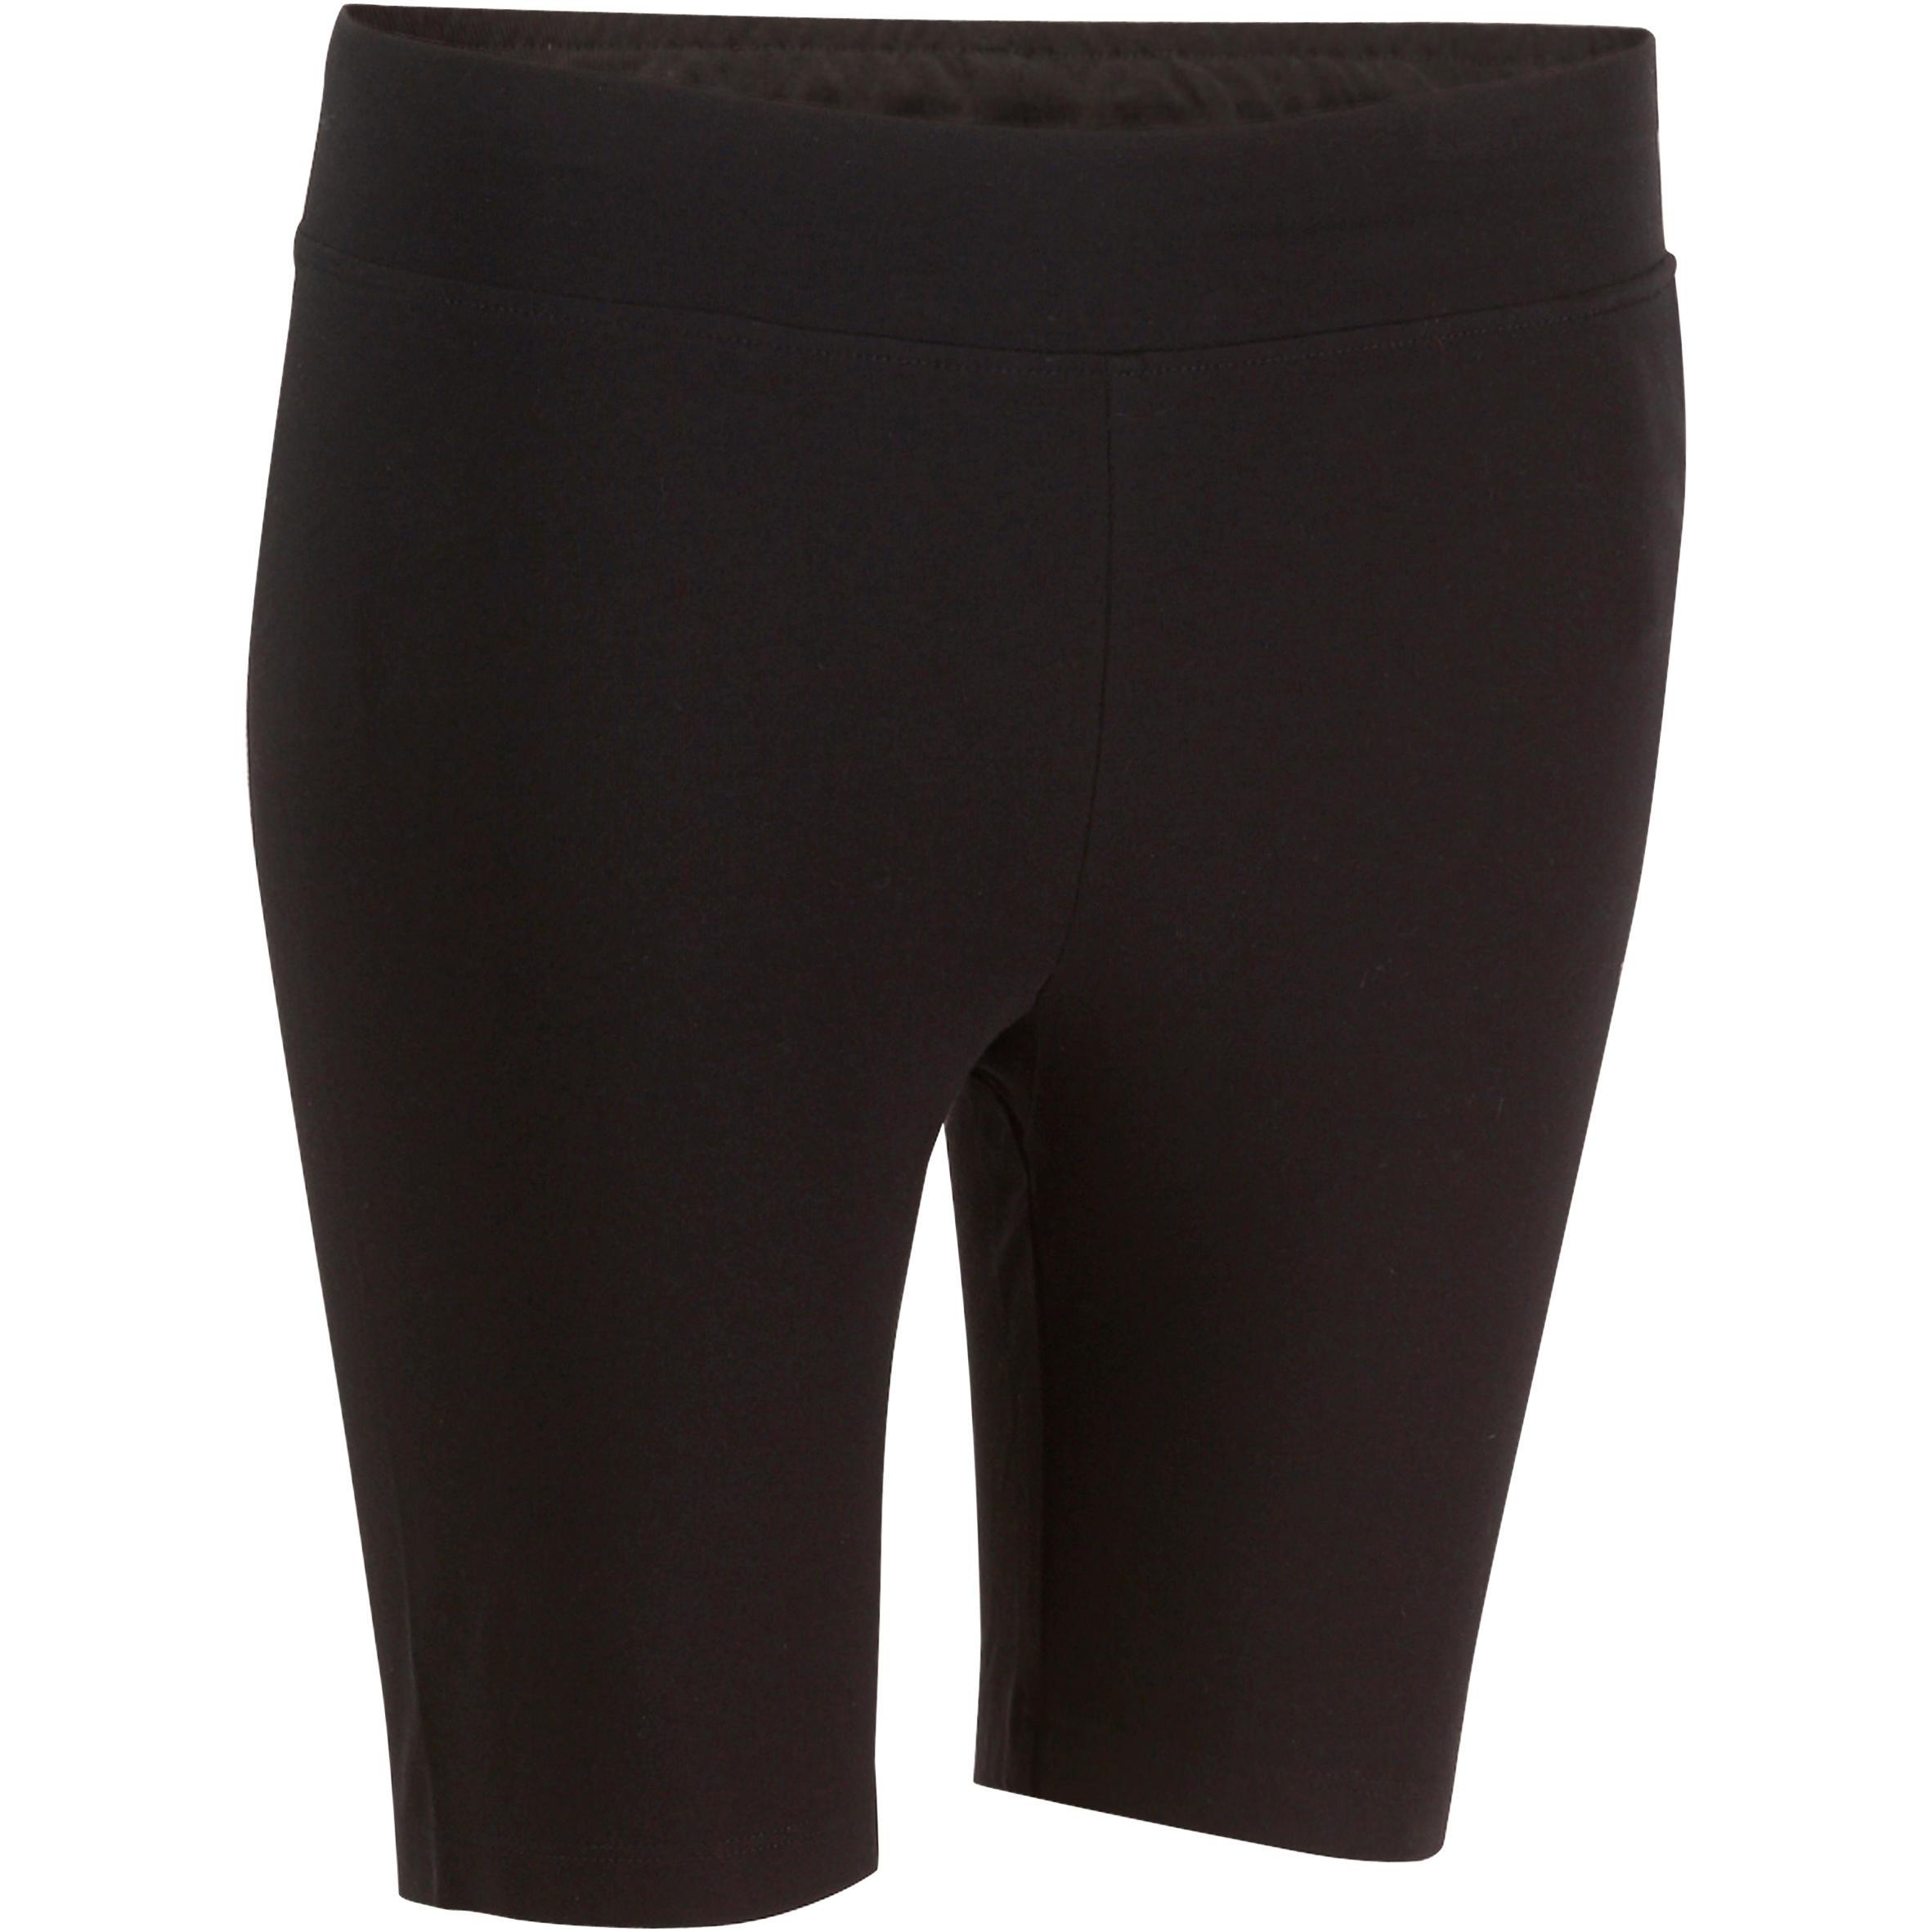 Mallas ciclistas FIT+ ajustadas, fitness mujer, negro